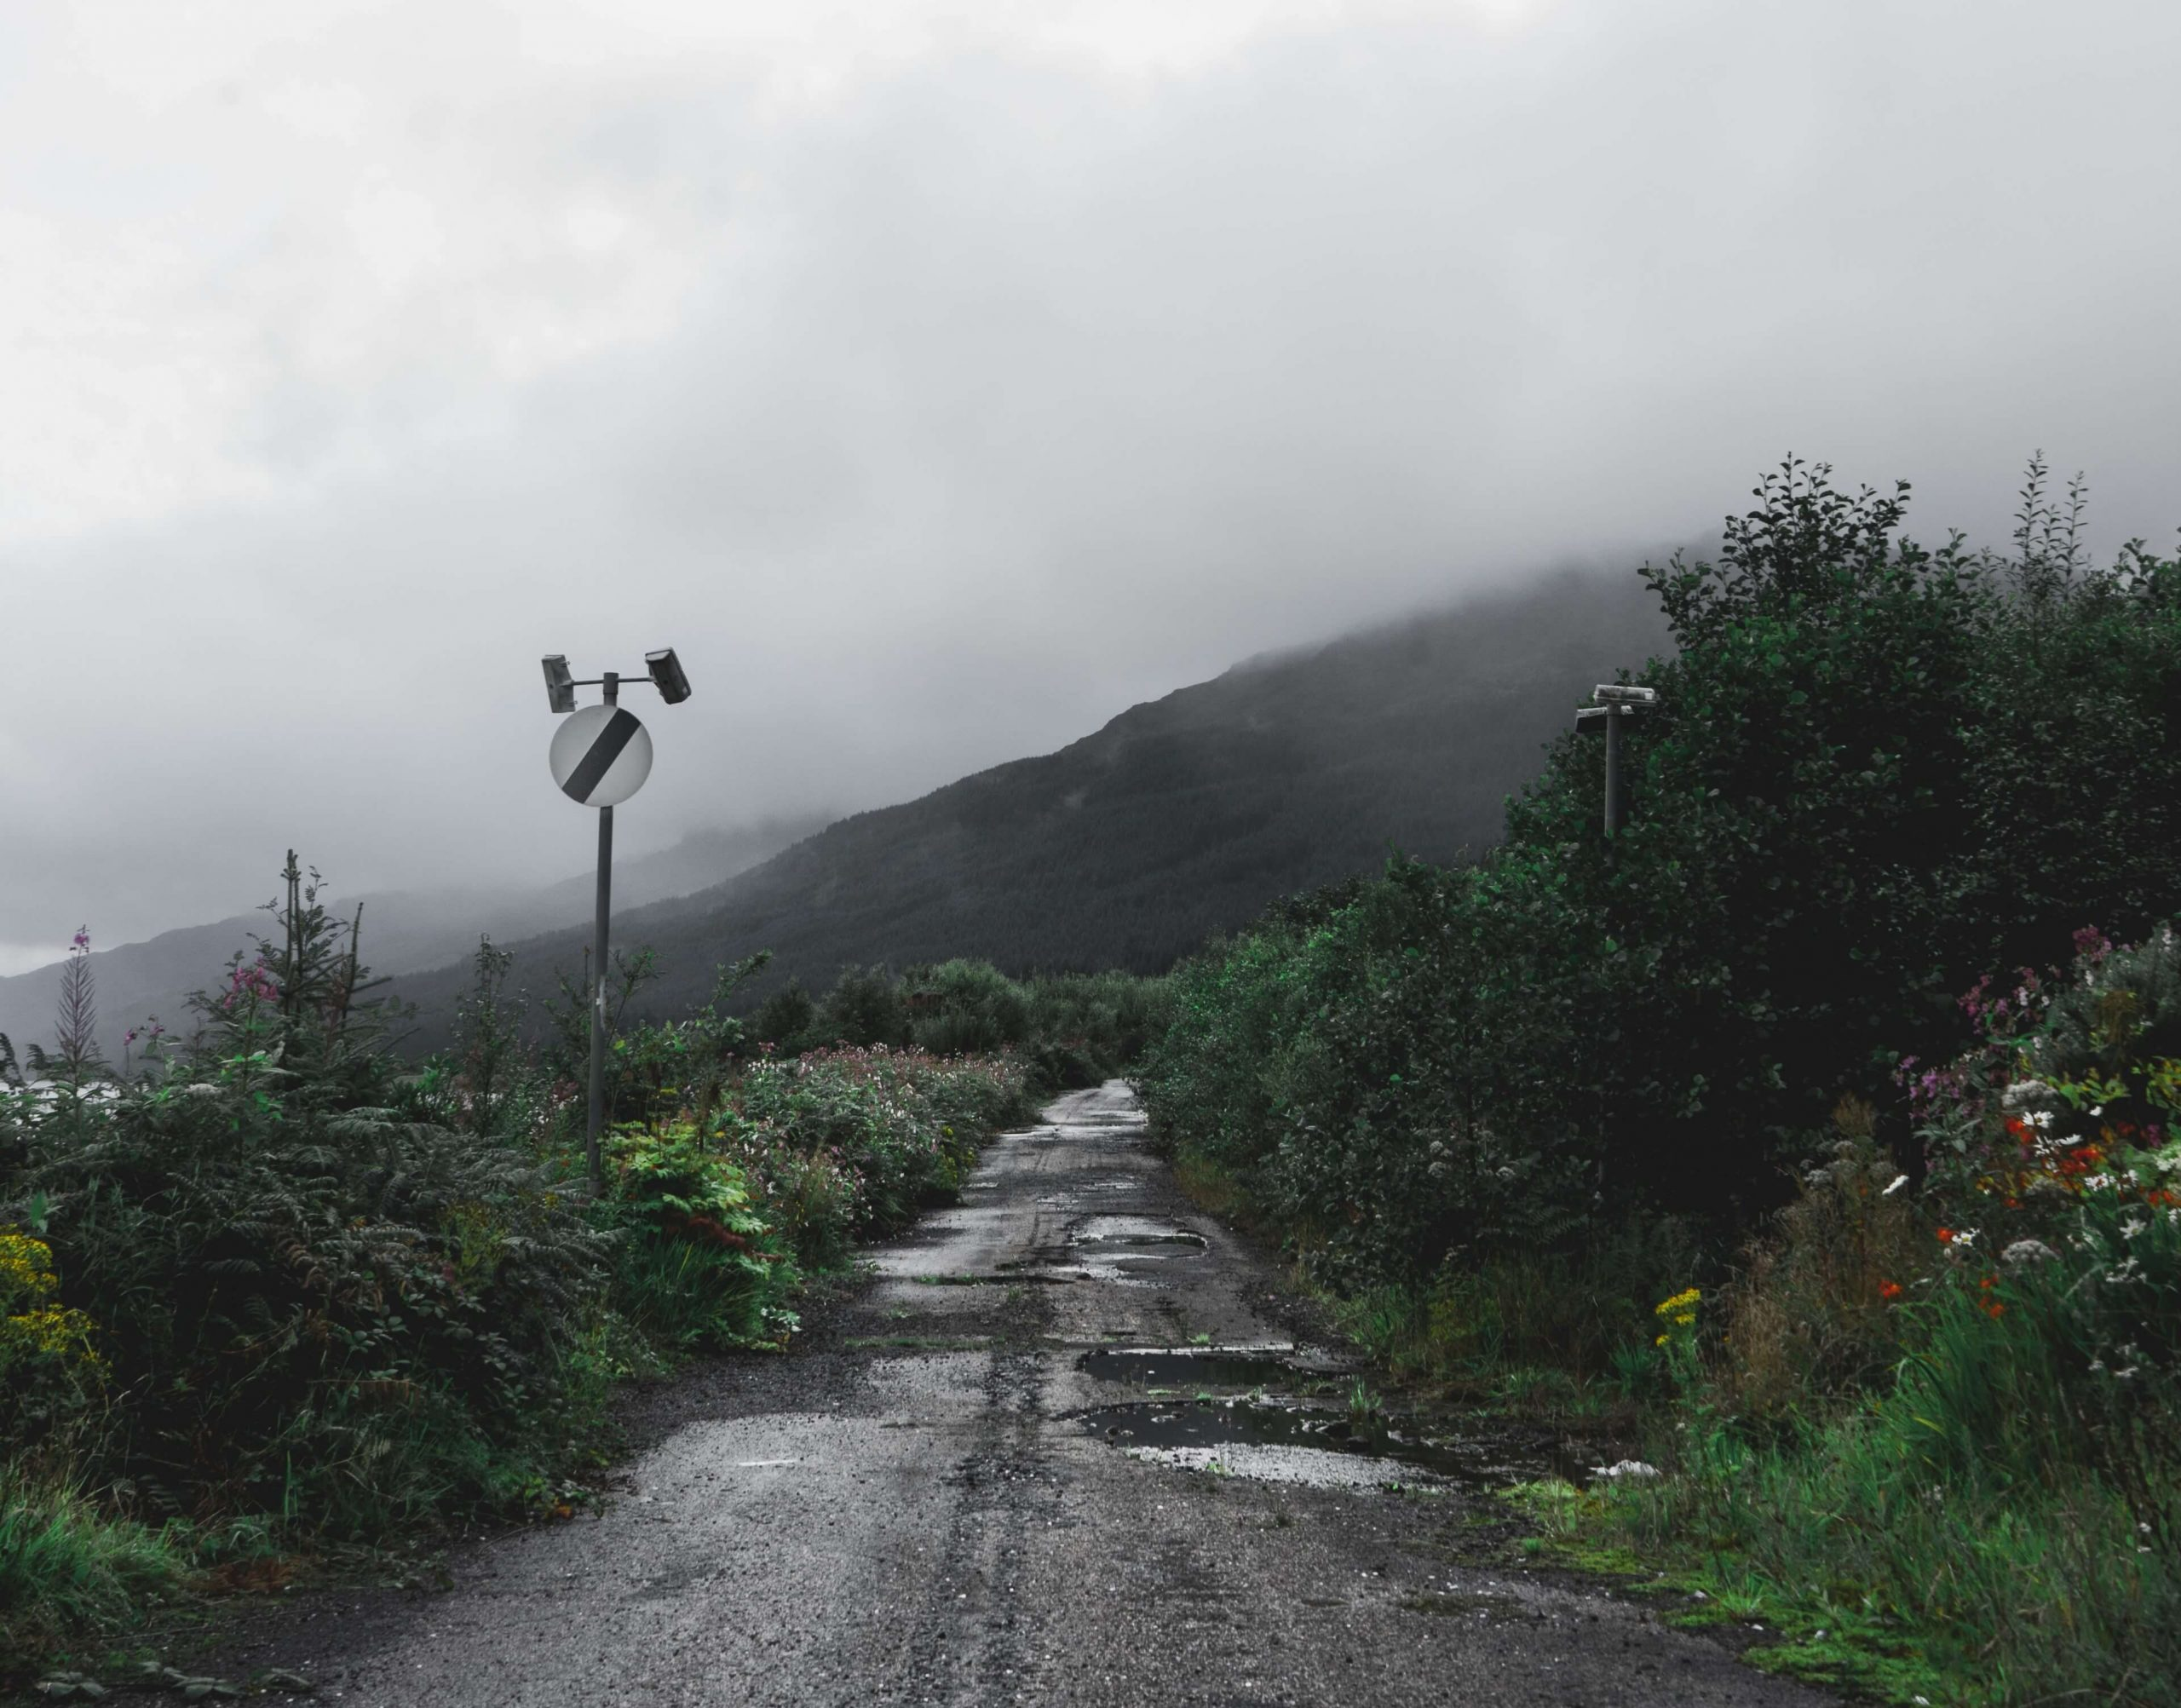 Road network irregularities detection